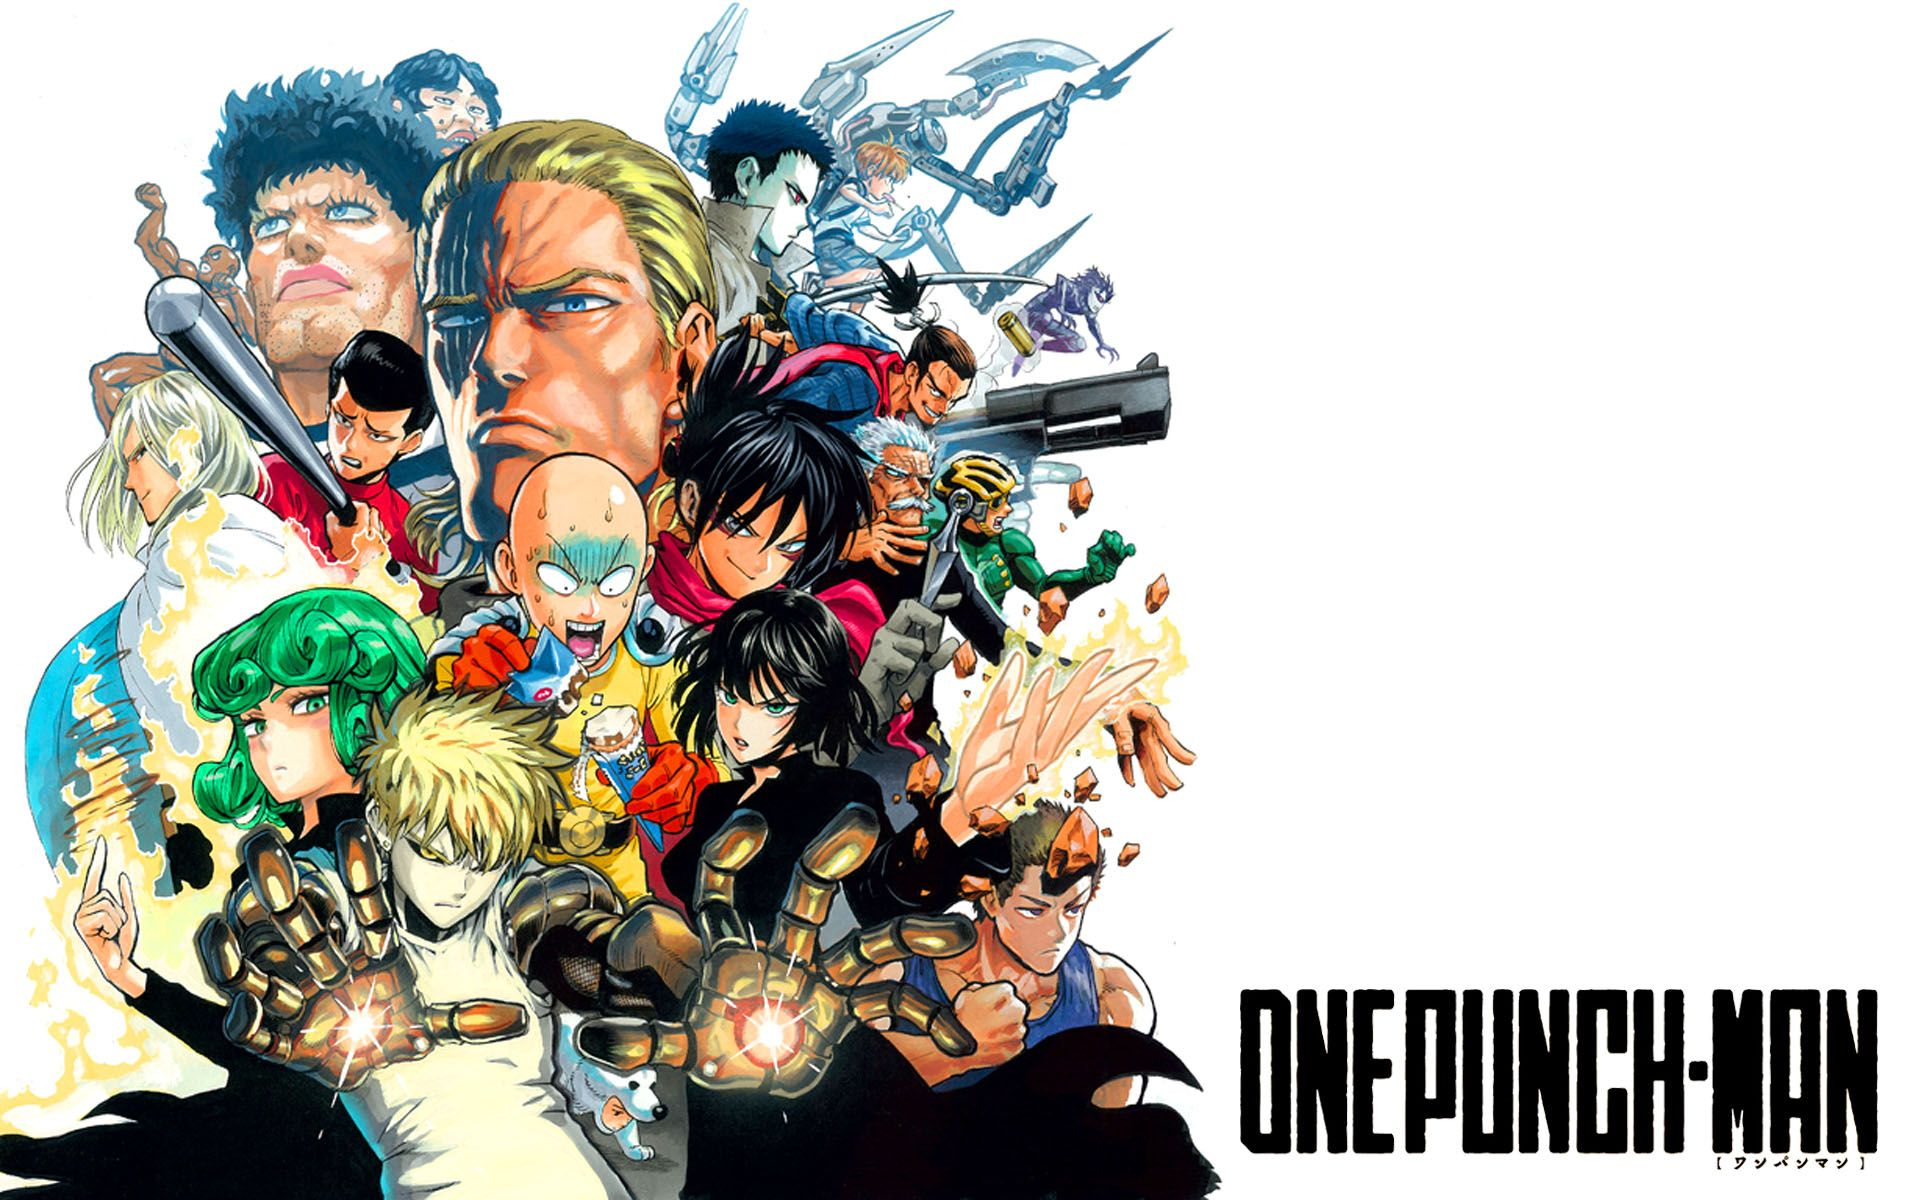 Superhero Class One Punch Man Anime Wallpaper HD 2015